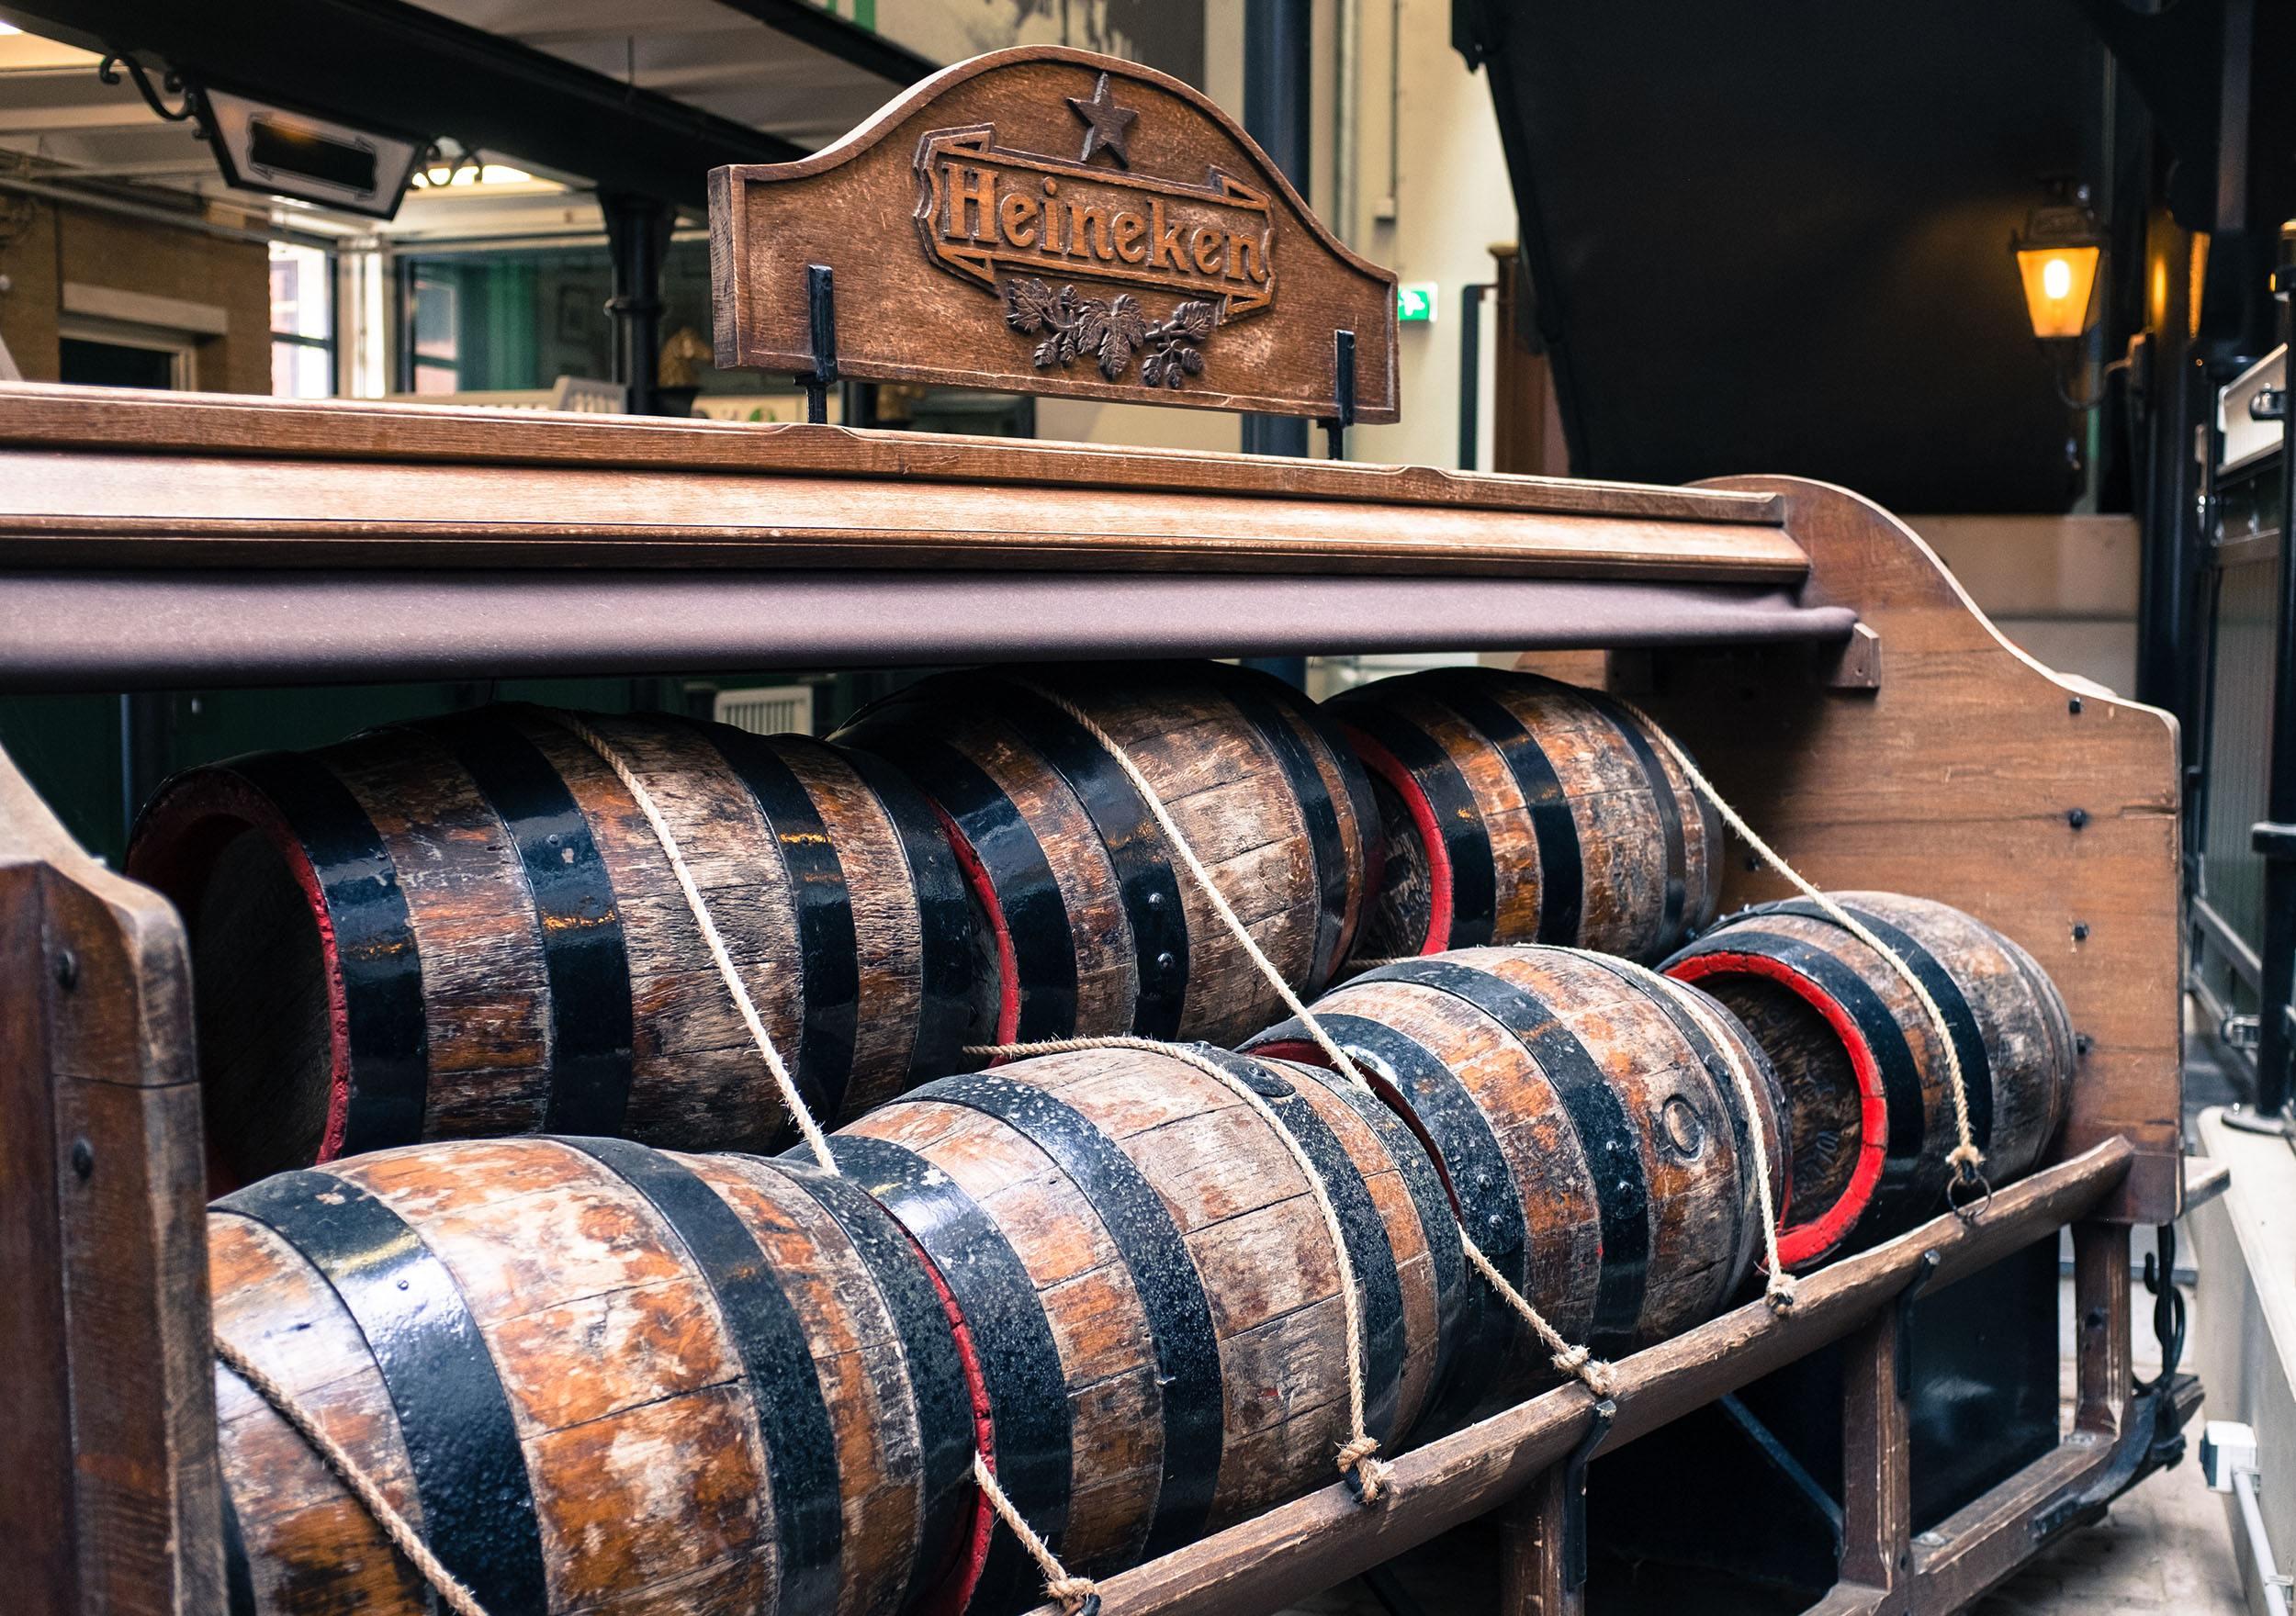 Old Heineken beer delivery barrels at the Heineken Experience in Amsterdam (Jenni Sheppard)